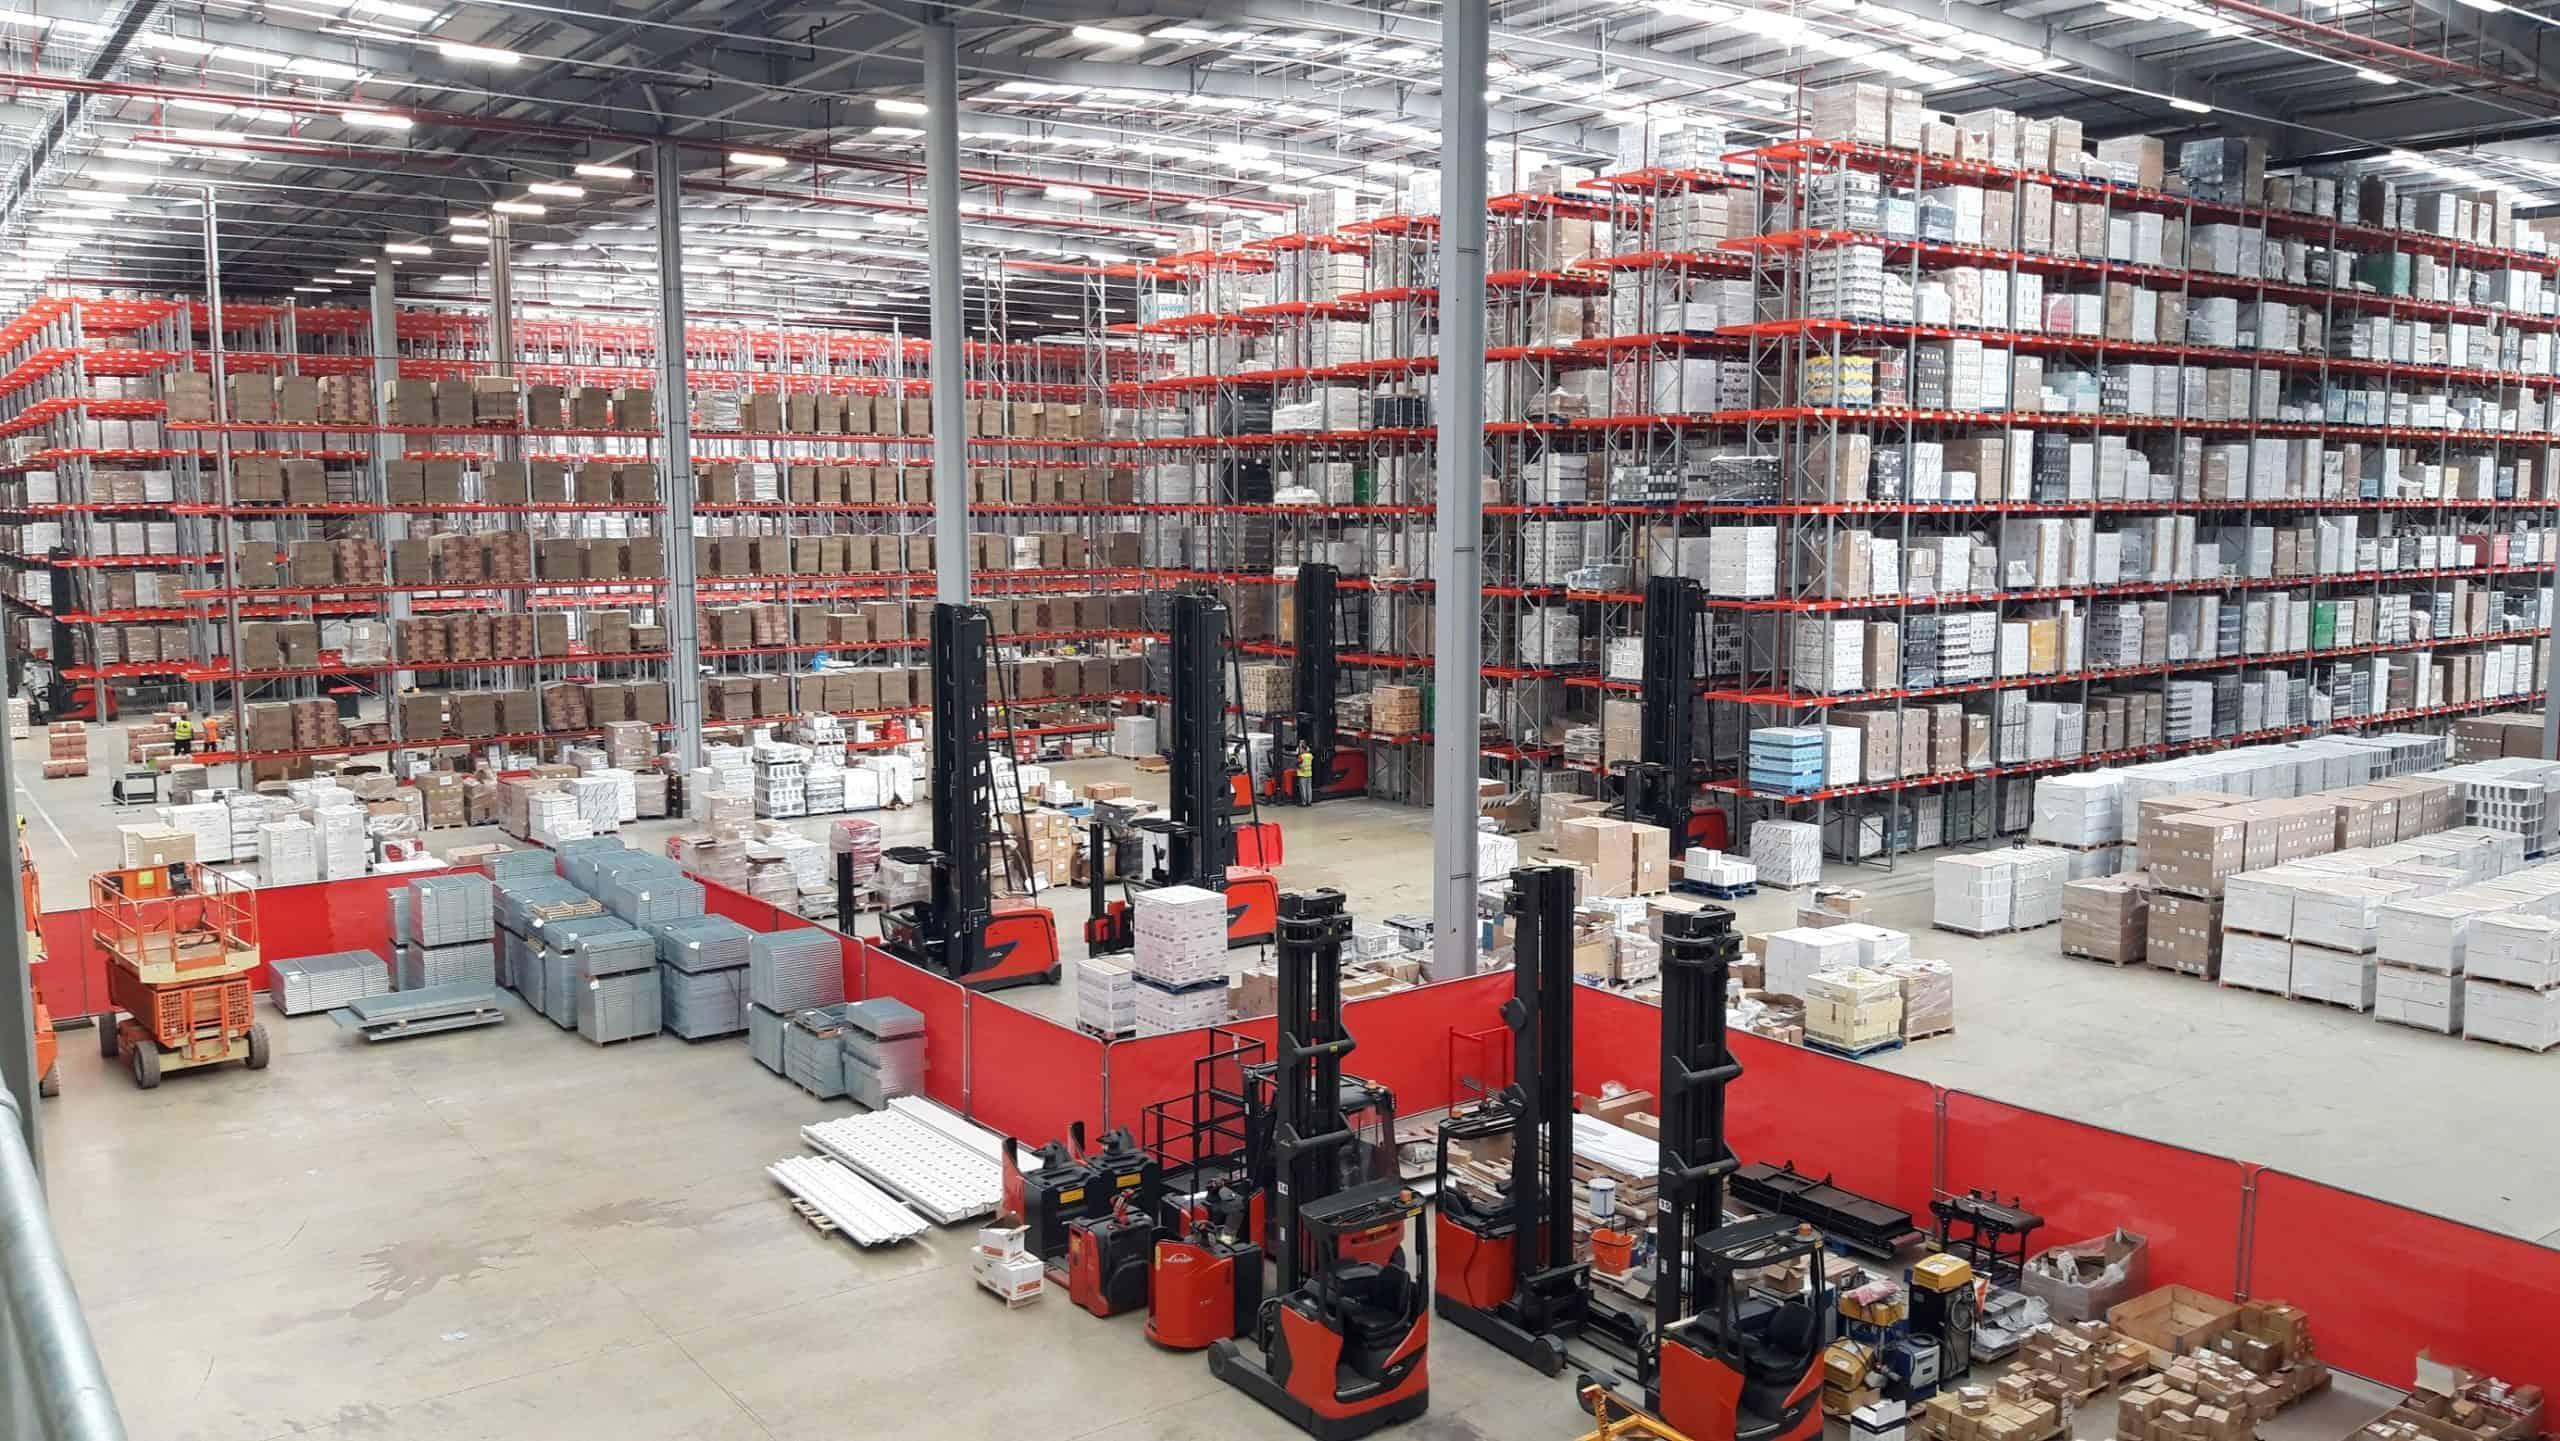 Europa Corby Warehouse